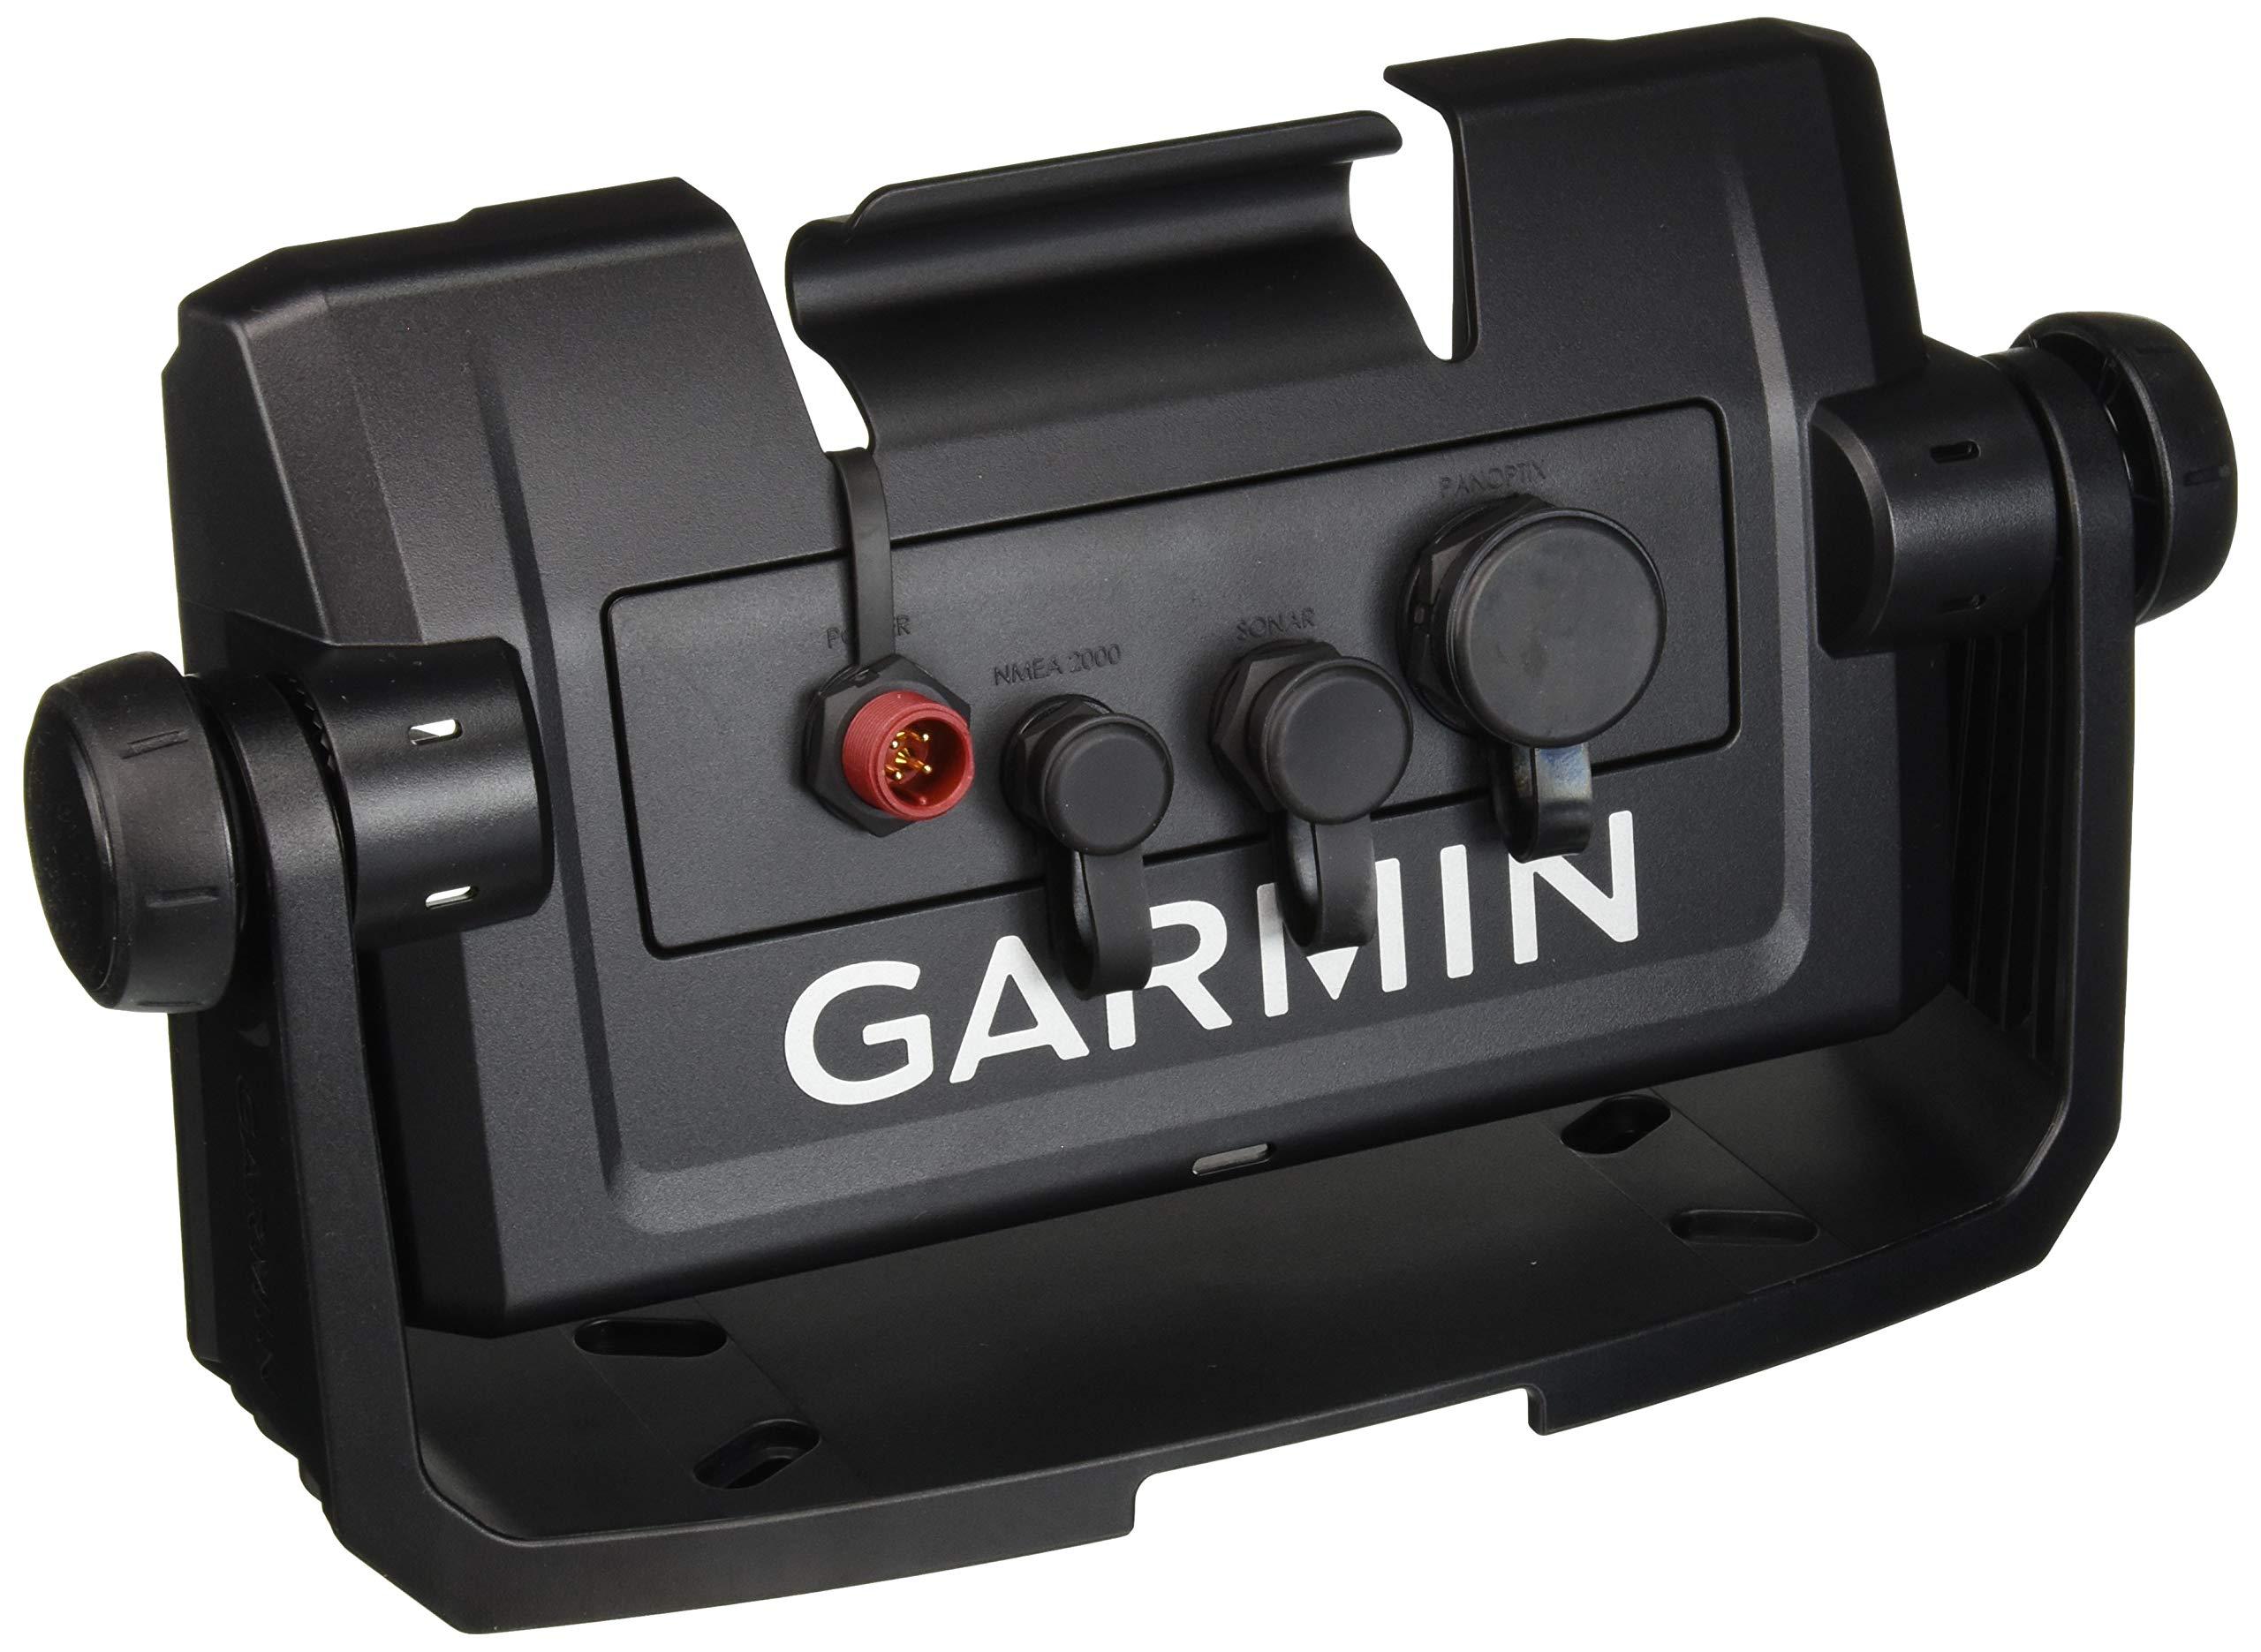 Garmin International, Inc. CS-200KIT International, 010-12673-03 Garmin Quick Mount Echomap Plus